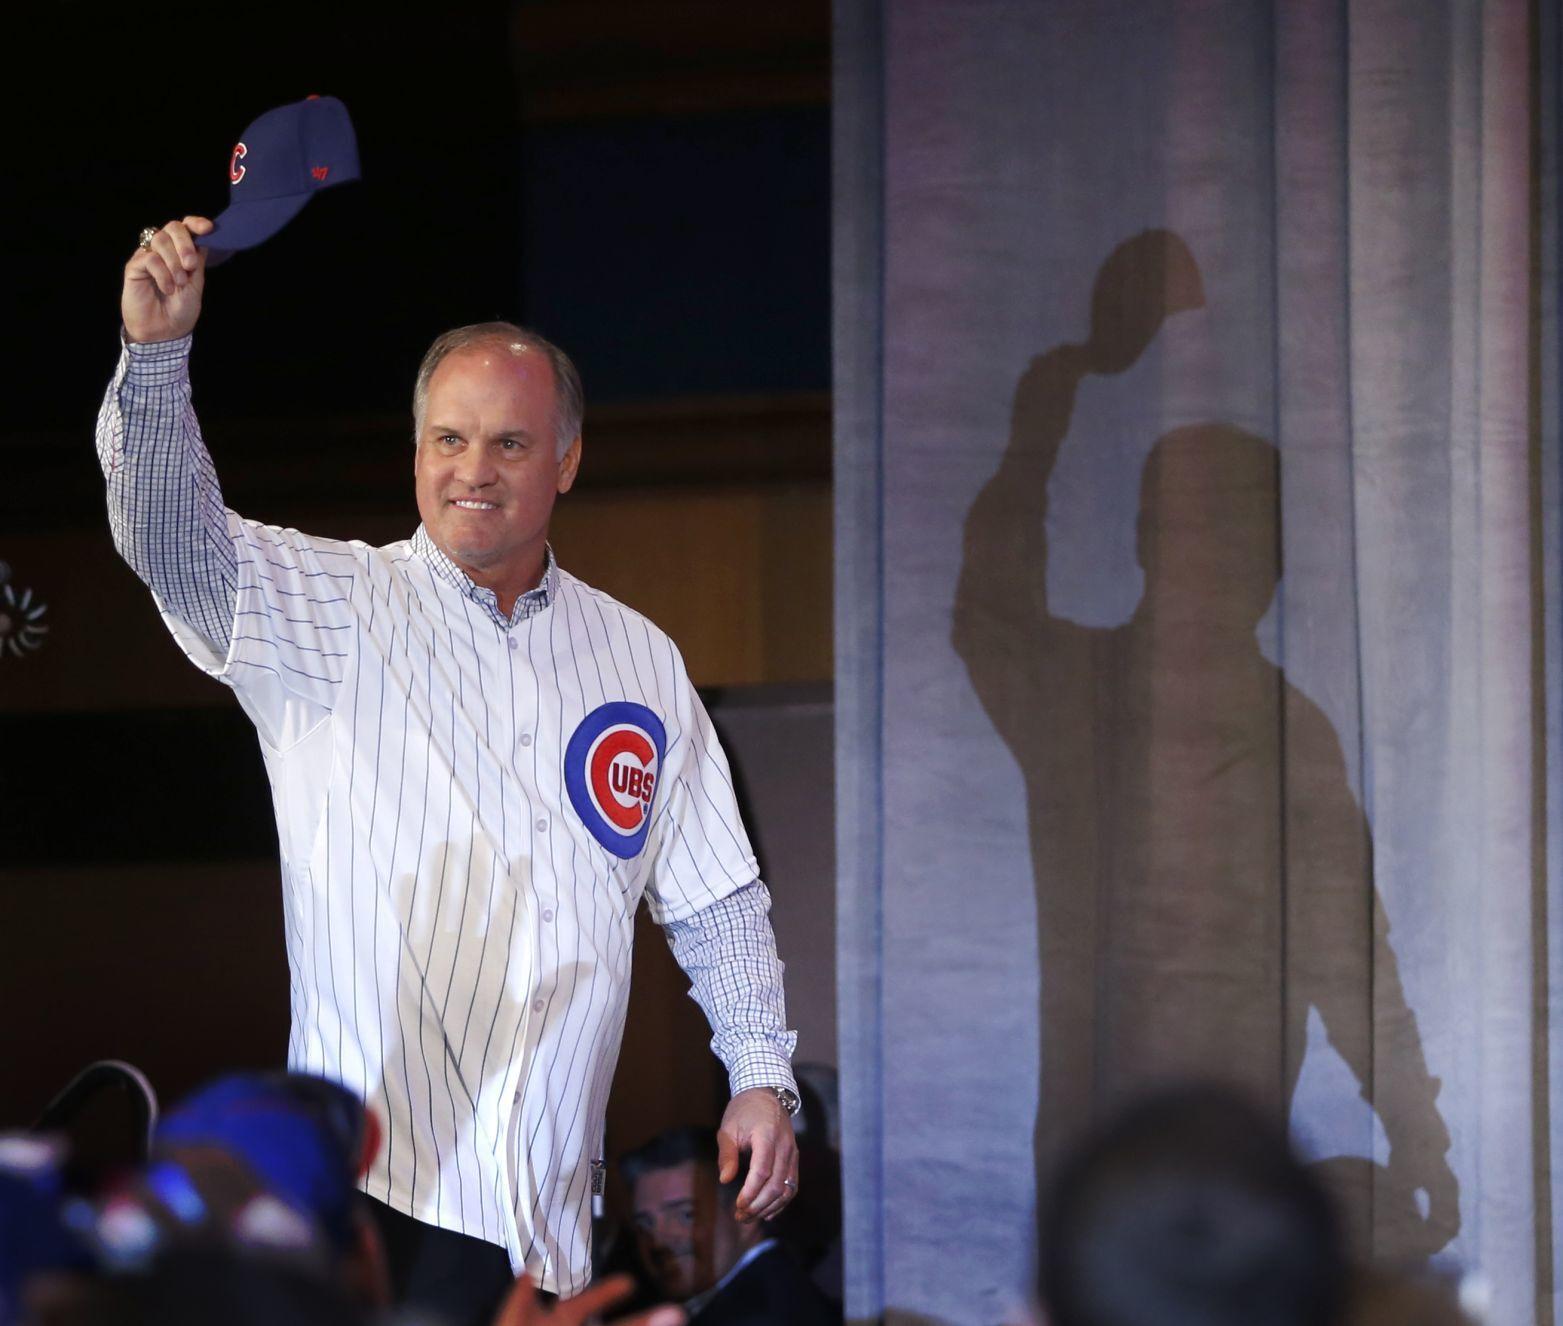 pantagraph.com - Robert Channick  Chicago Tribune - Cubs great Ryne Sandberg new spokesman for Chicago-based weed retailer Verilife